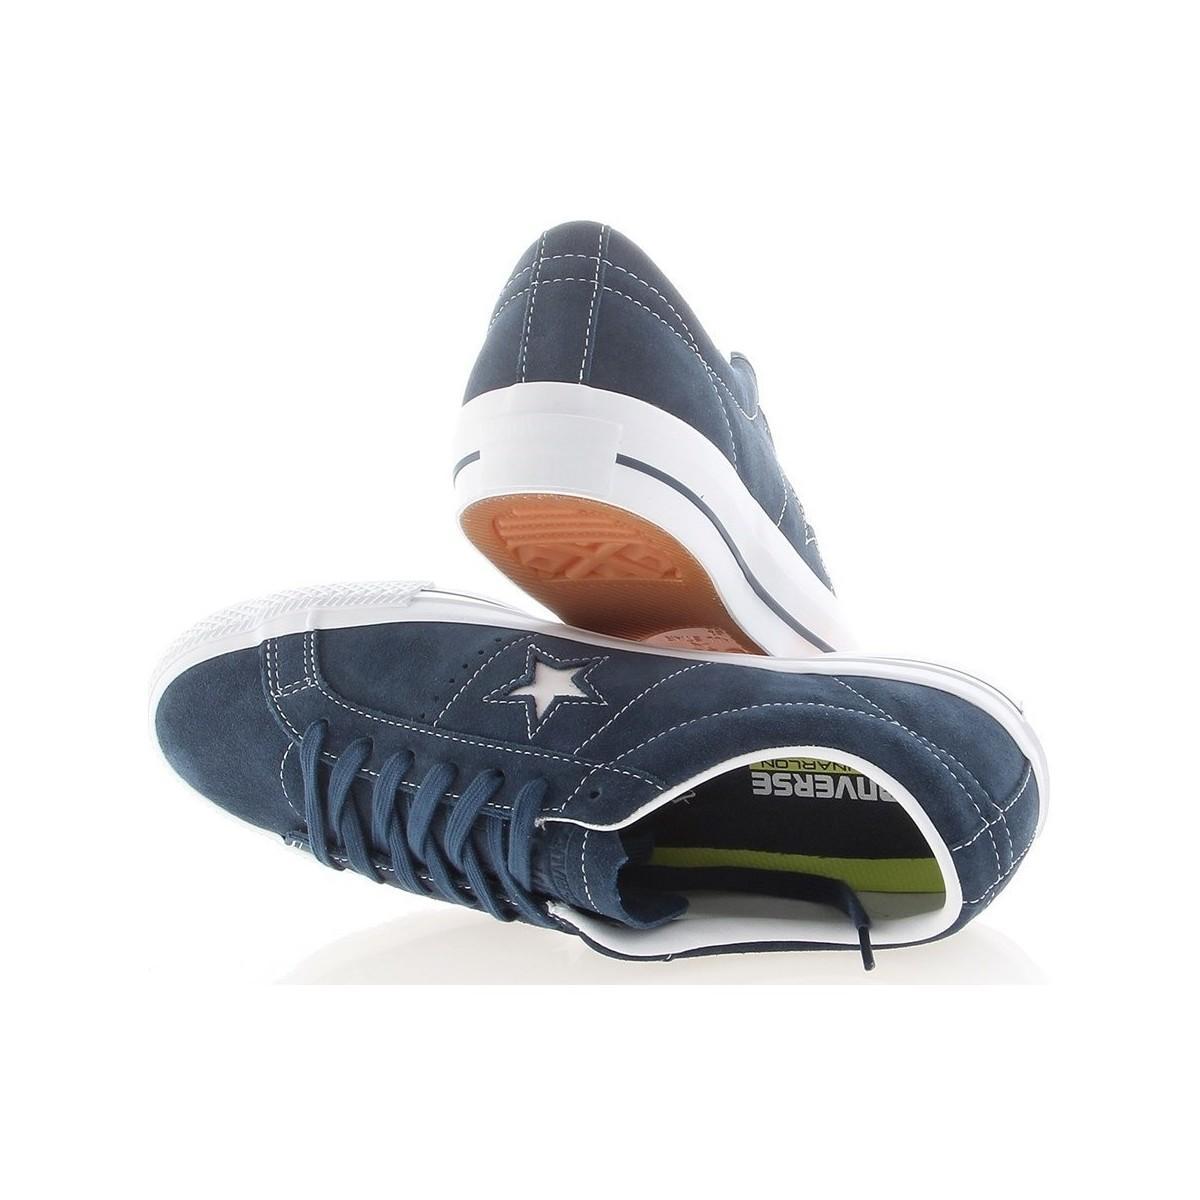 Converse One Star Skate Skate Shoe in Blue for Men